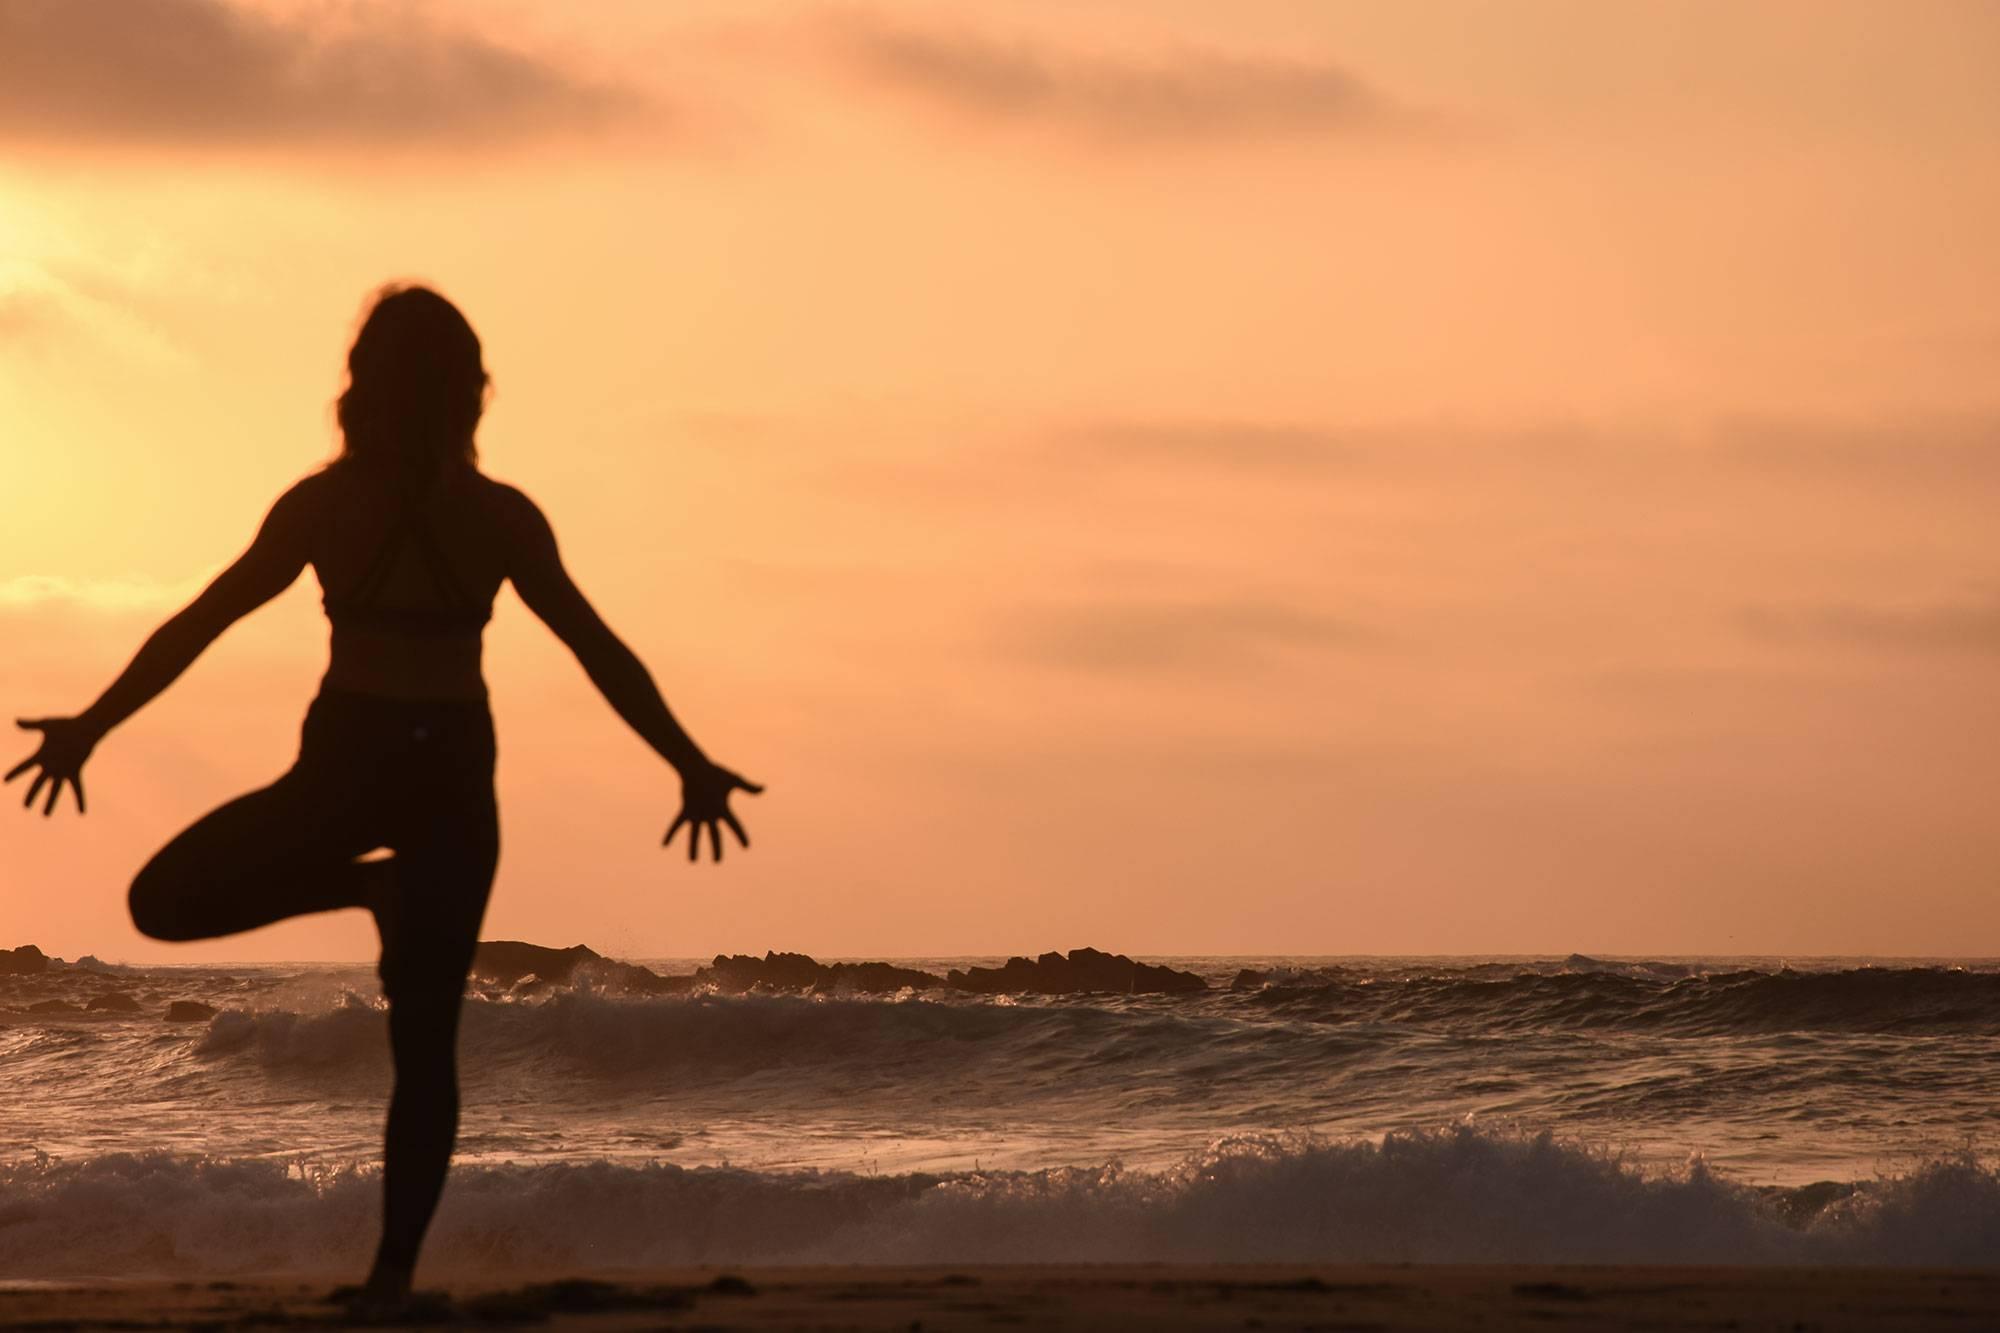 https://www.soulandsurf.com/wp-content/uploads/2021/07/@katiearaephoto_Yoga_On-the-beach_6.jpg Image